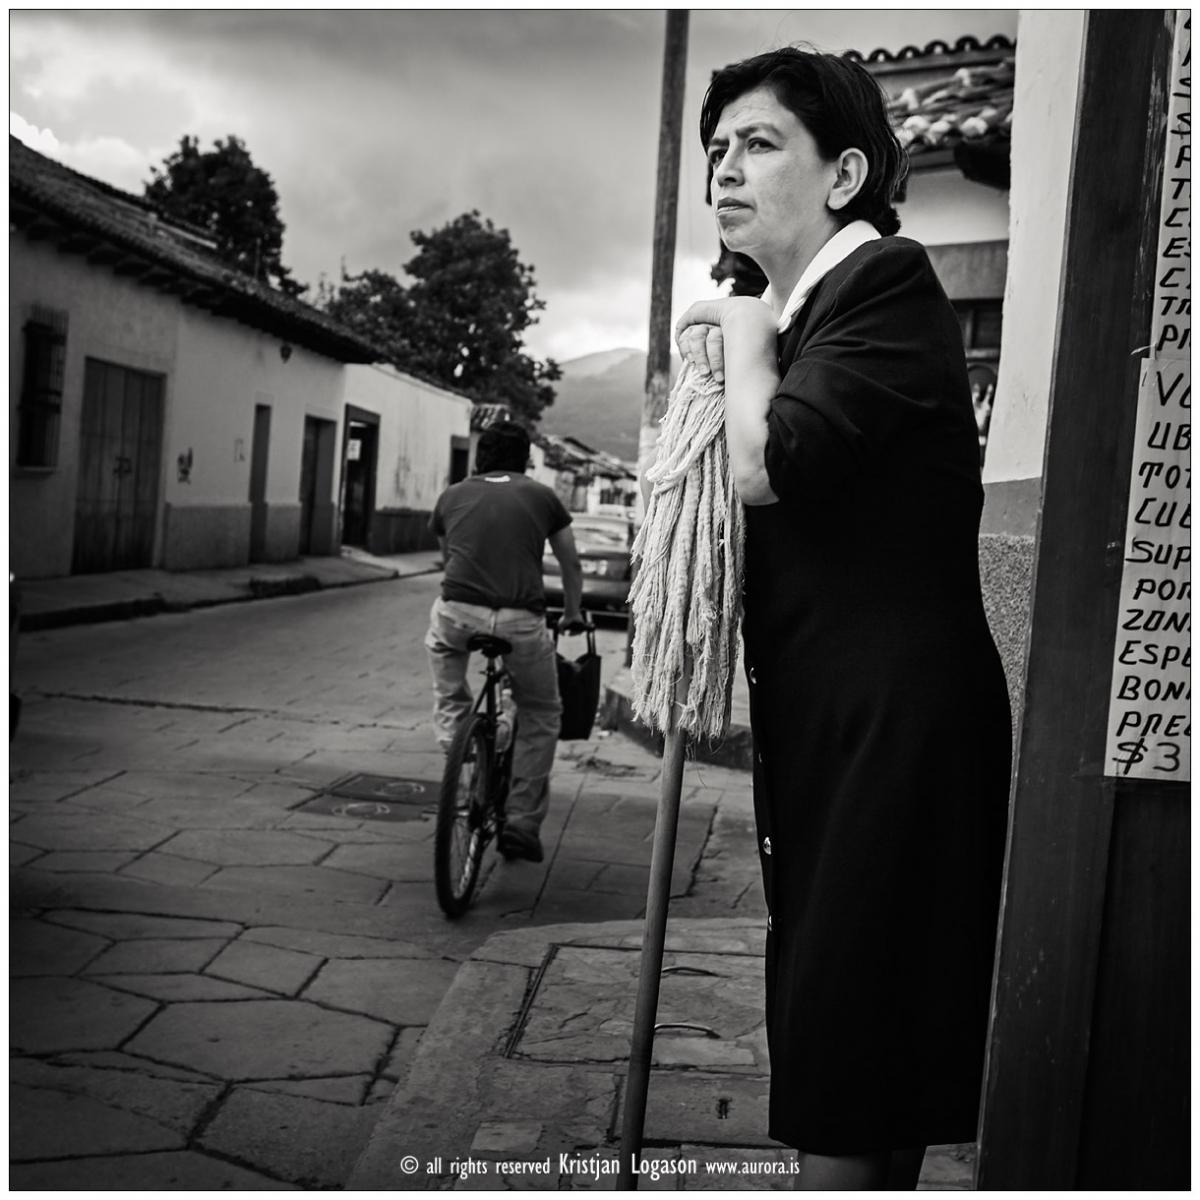 Woman with broom in the street of San Cristobal las Casas